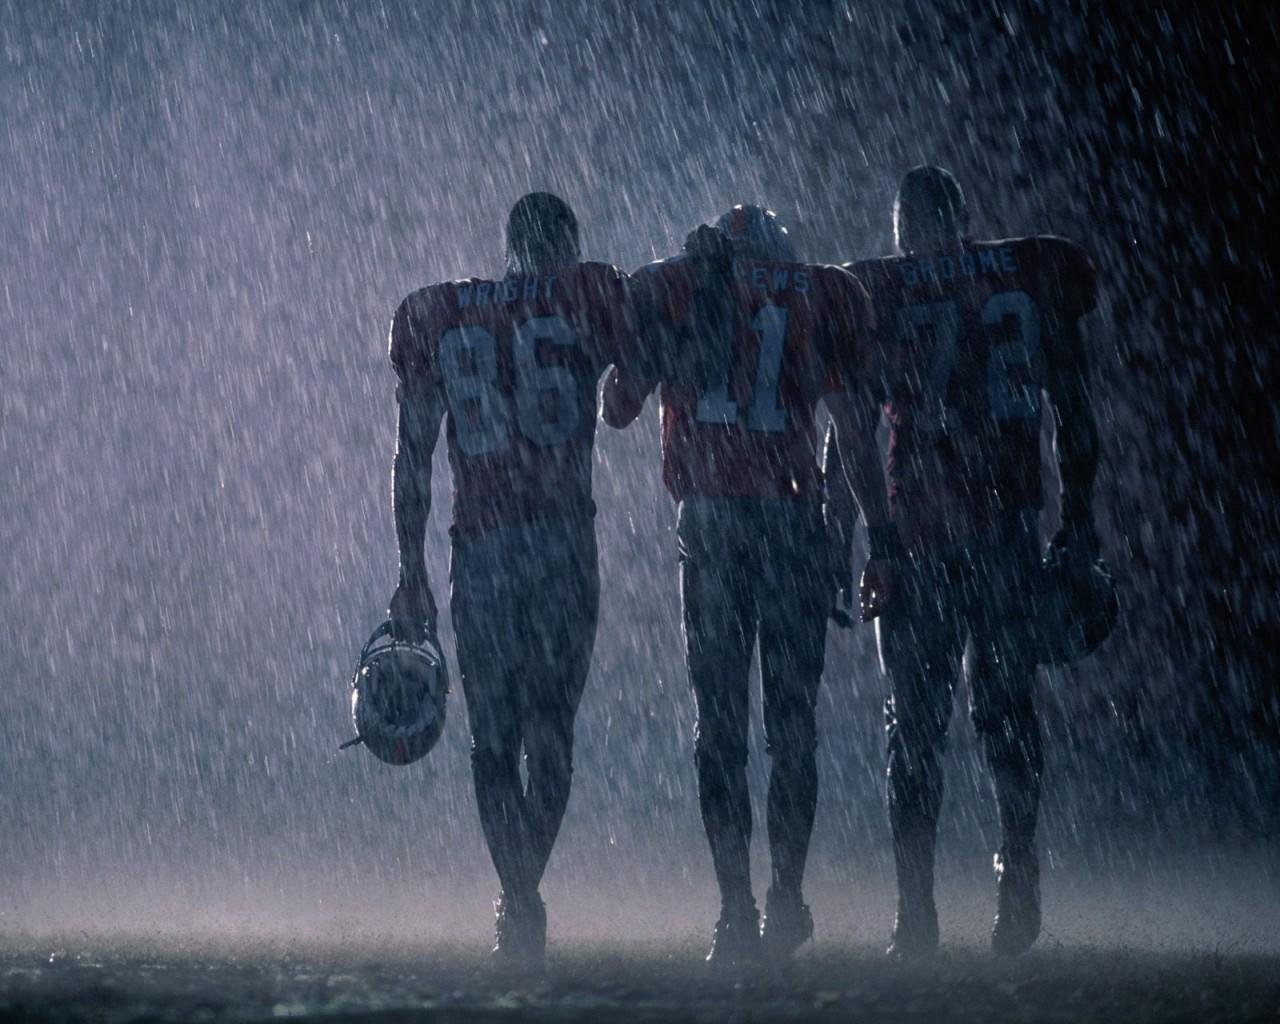 american football nfl team spirit 1280x1024